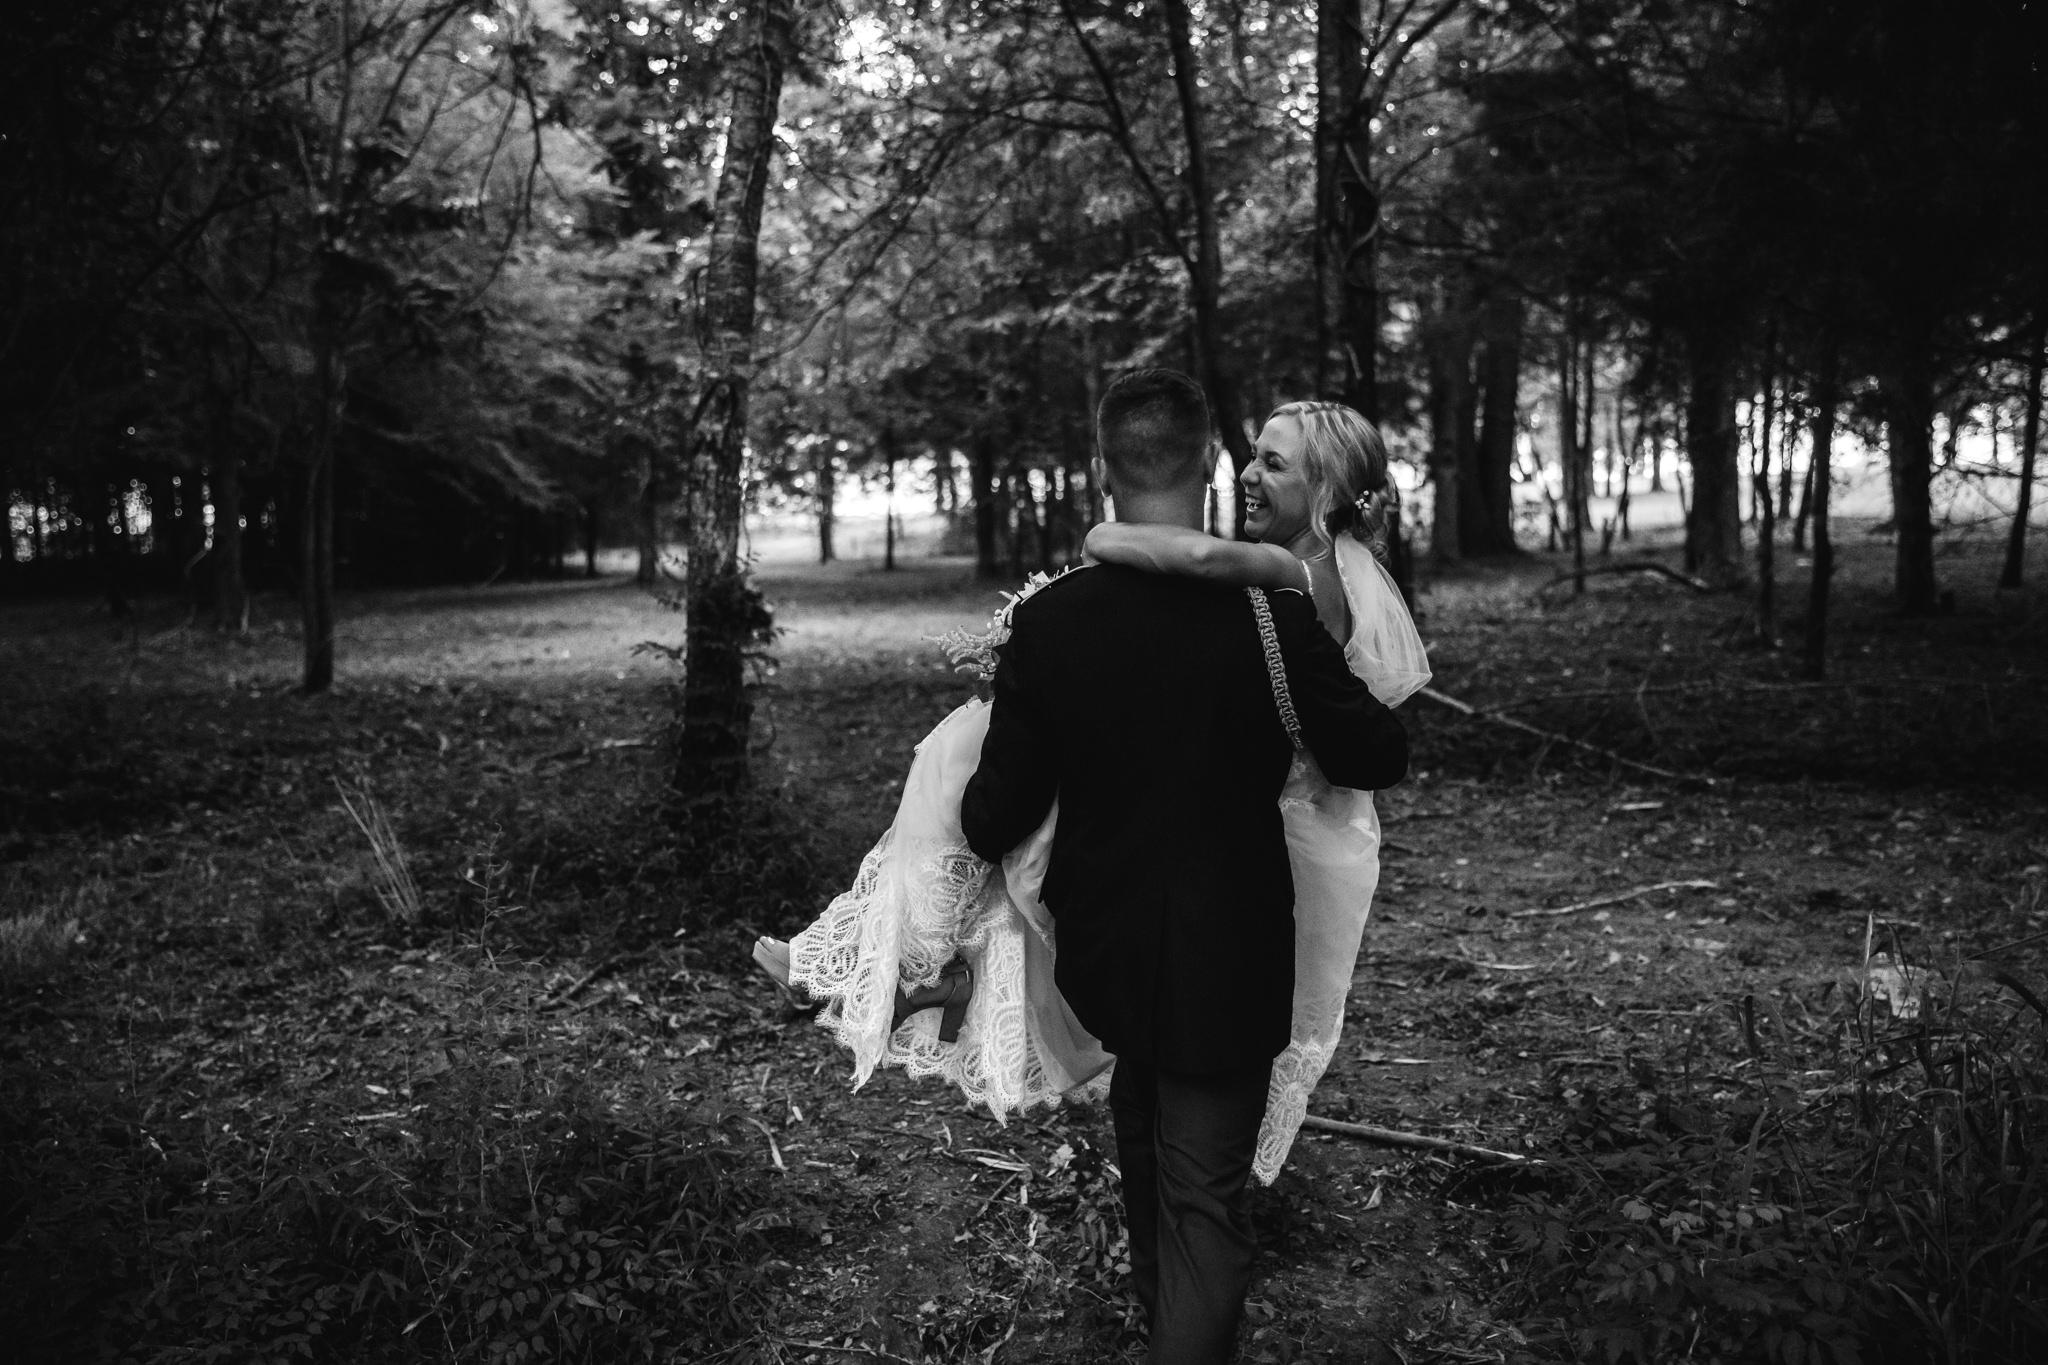 backyard-wedding-thewarmtharoundyou-lexy-branson-6-2.jpg